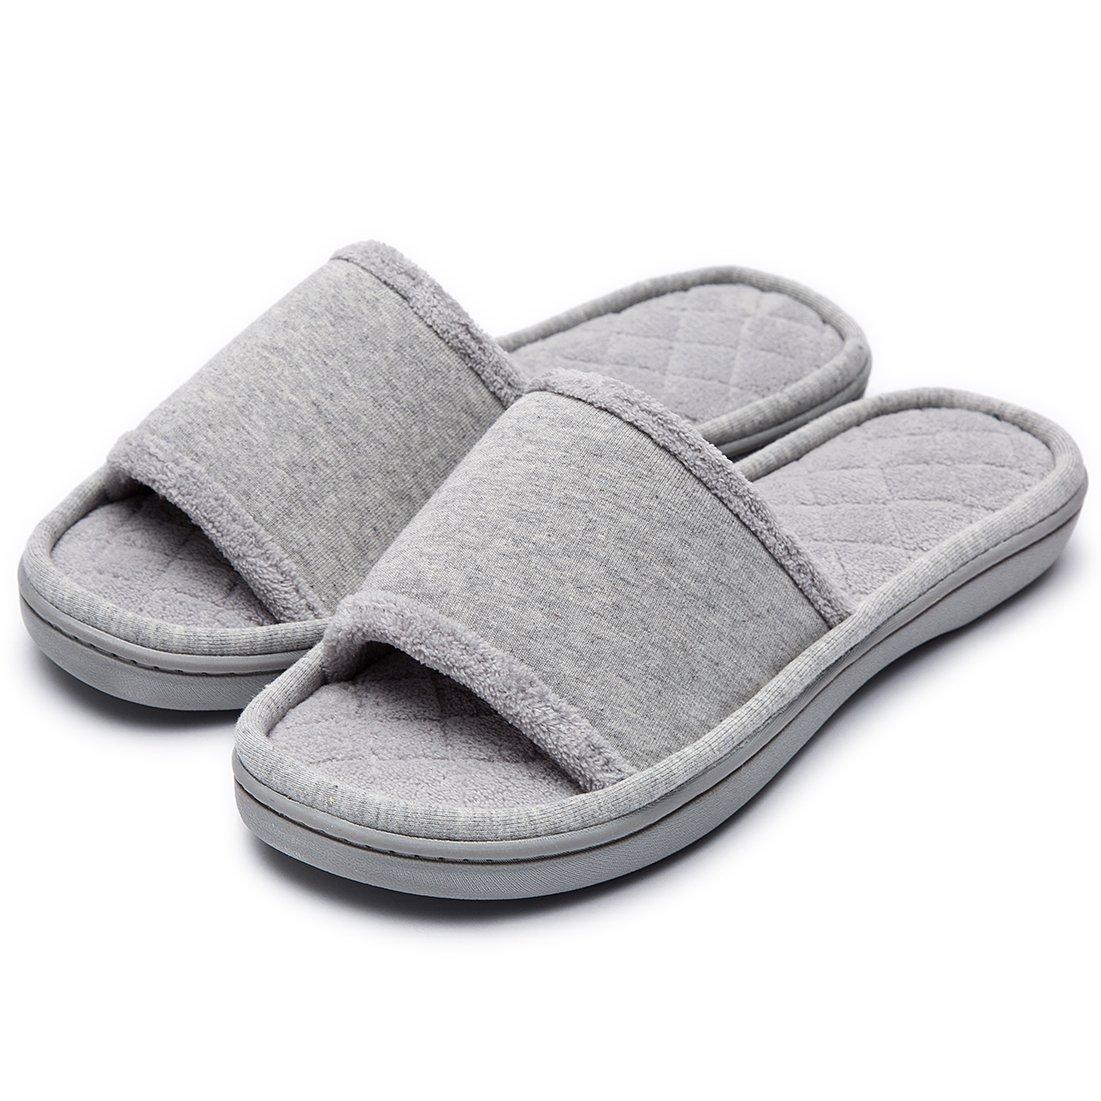 Women's Comfort Memory Foam Cotton House Slippers Spa Shoes w/Fleece Lining & Anti-Skid Rubber Sole (Large / 9-10 B(M) US, Gray)